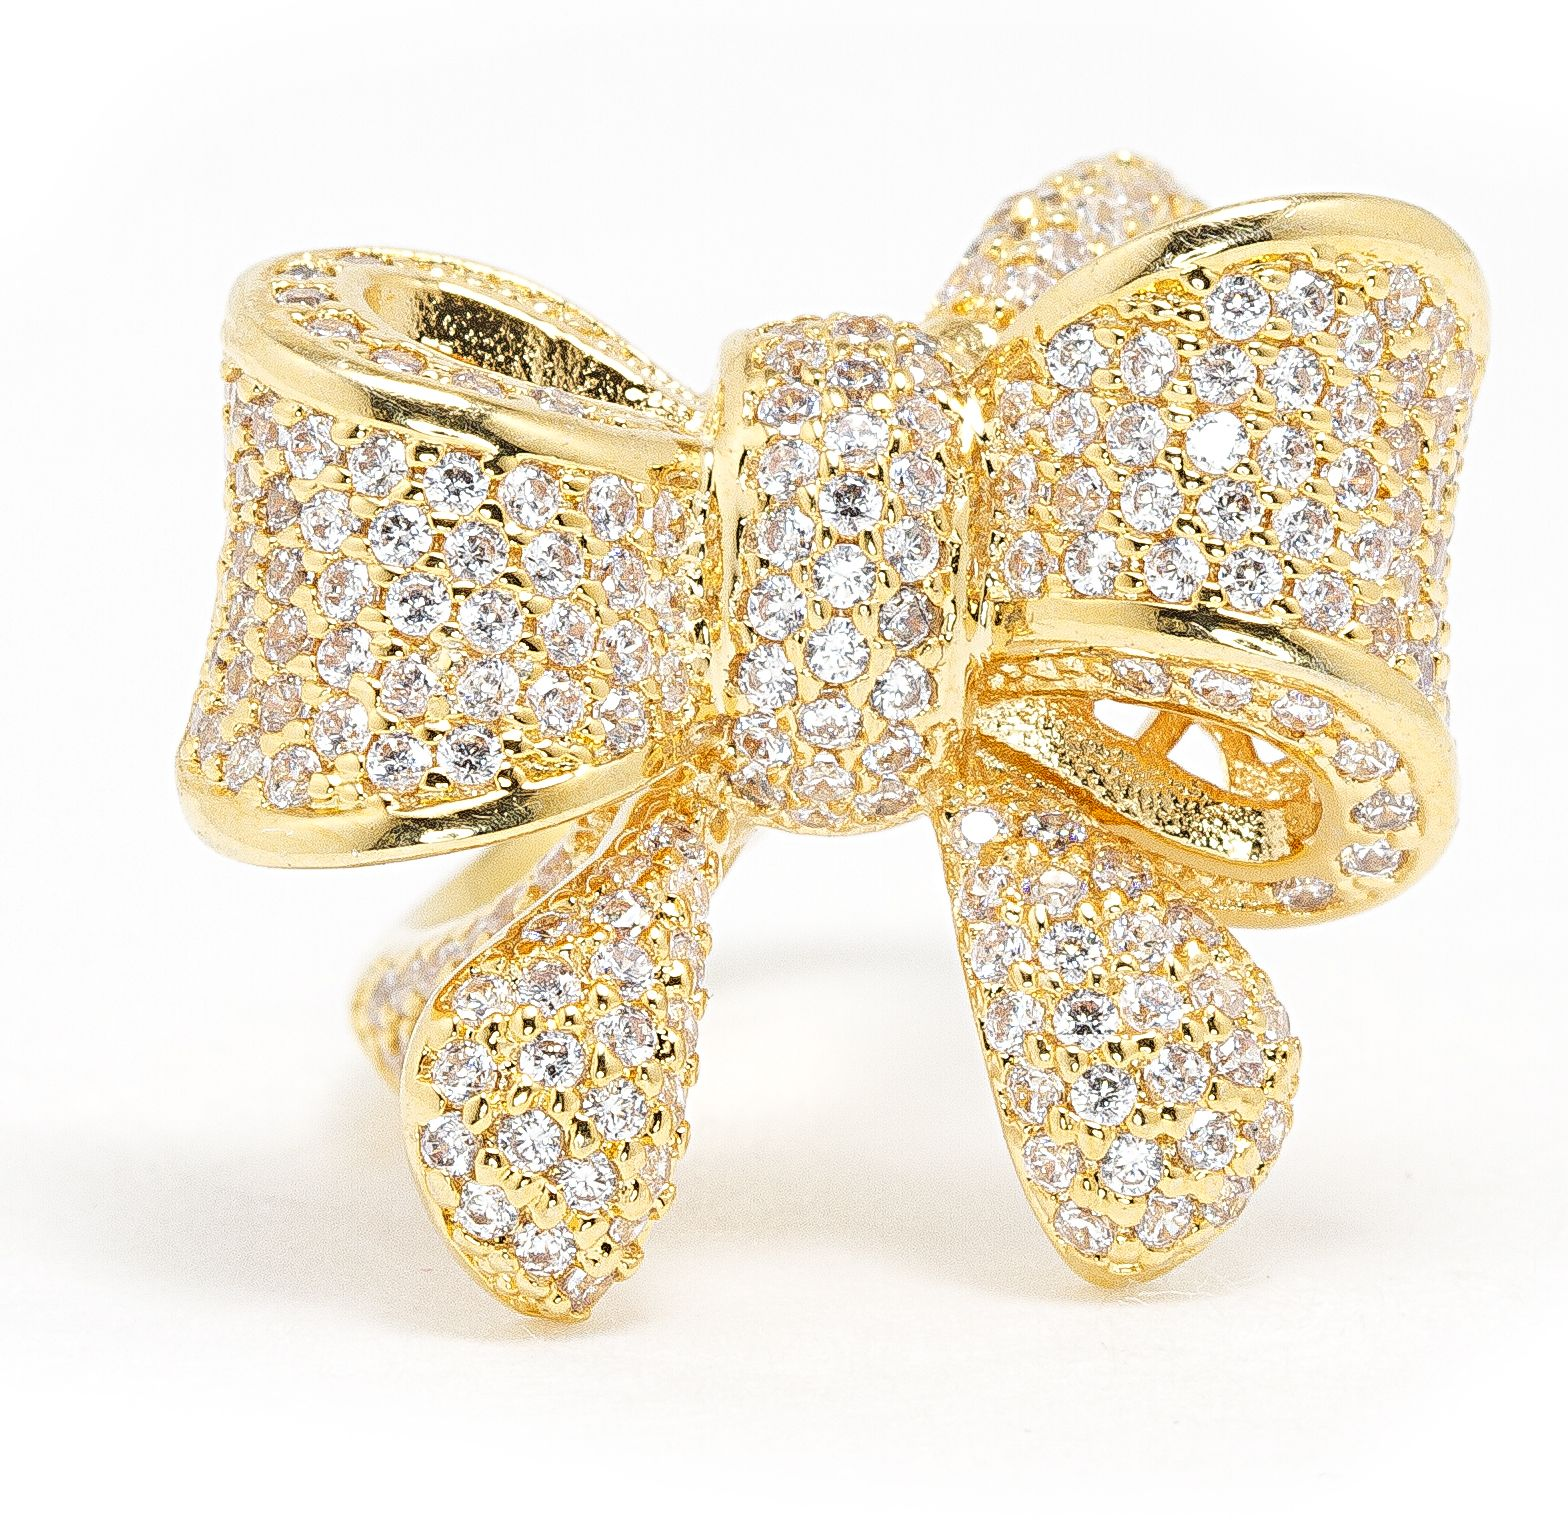 10++ Small dainty wedding rings info